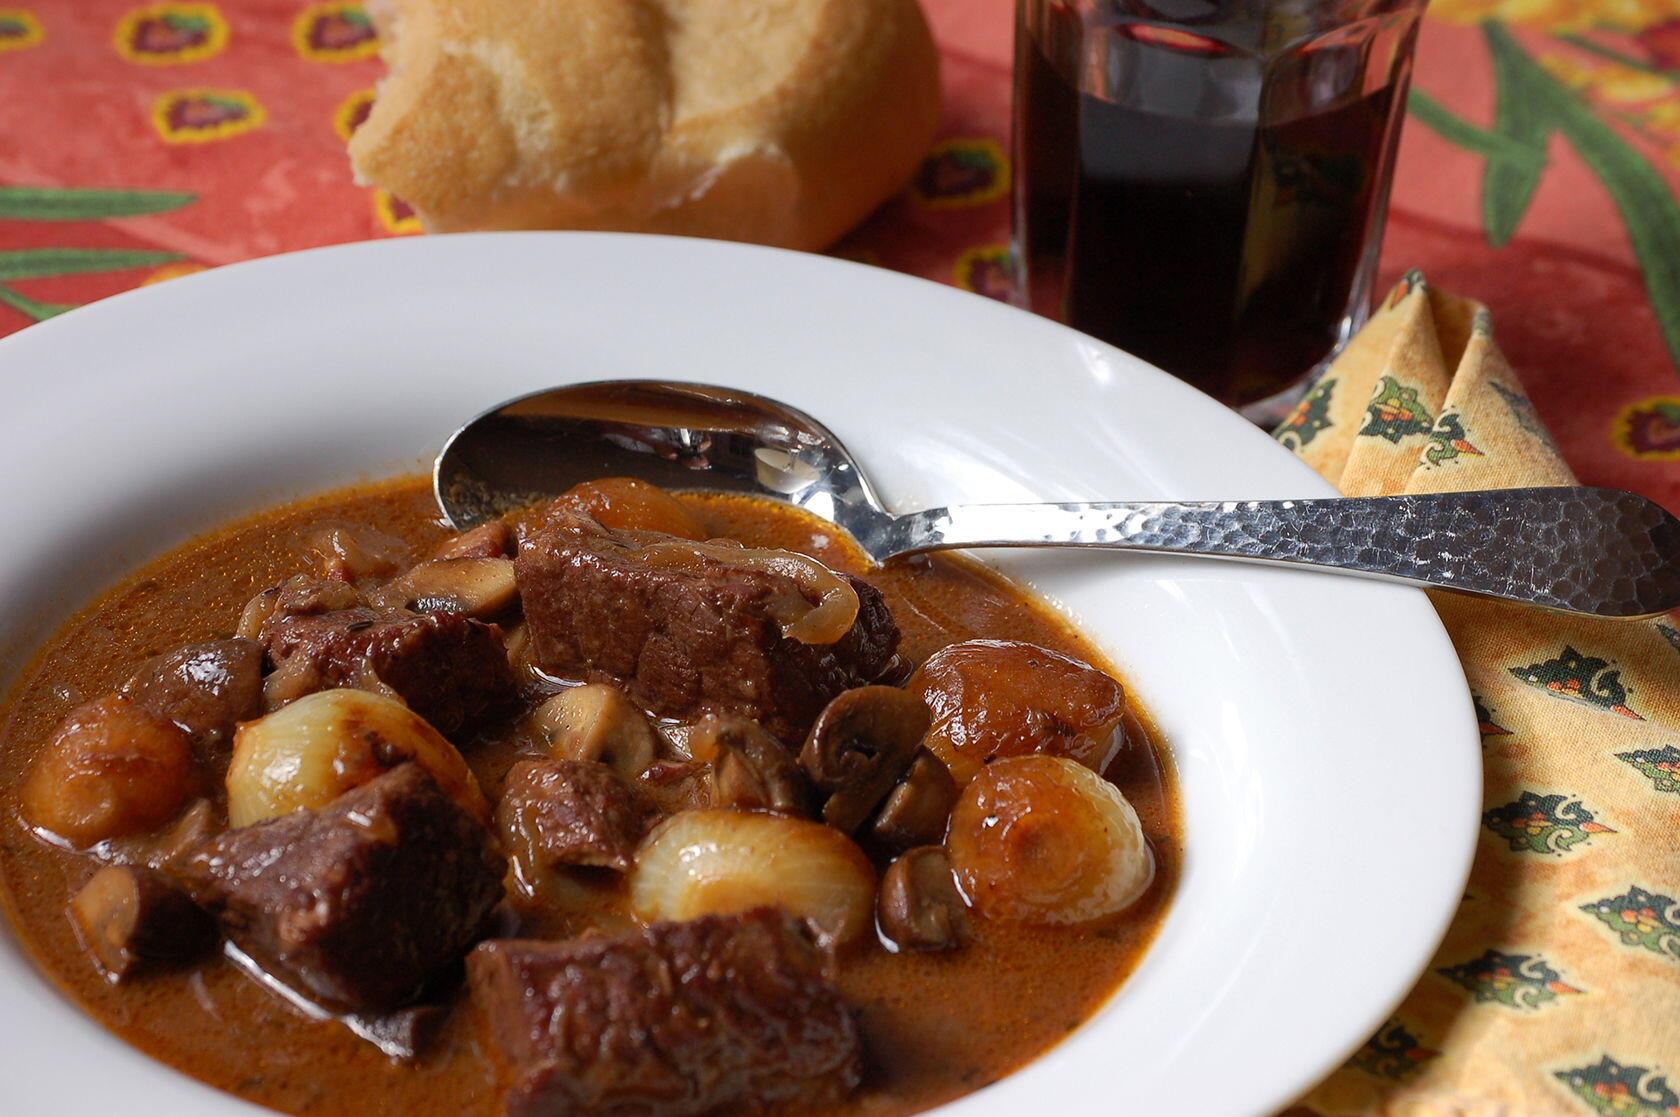 a provencal variation of boeuf bourguignon perfectly